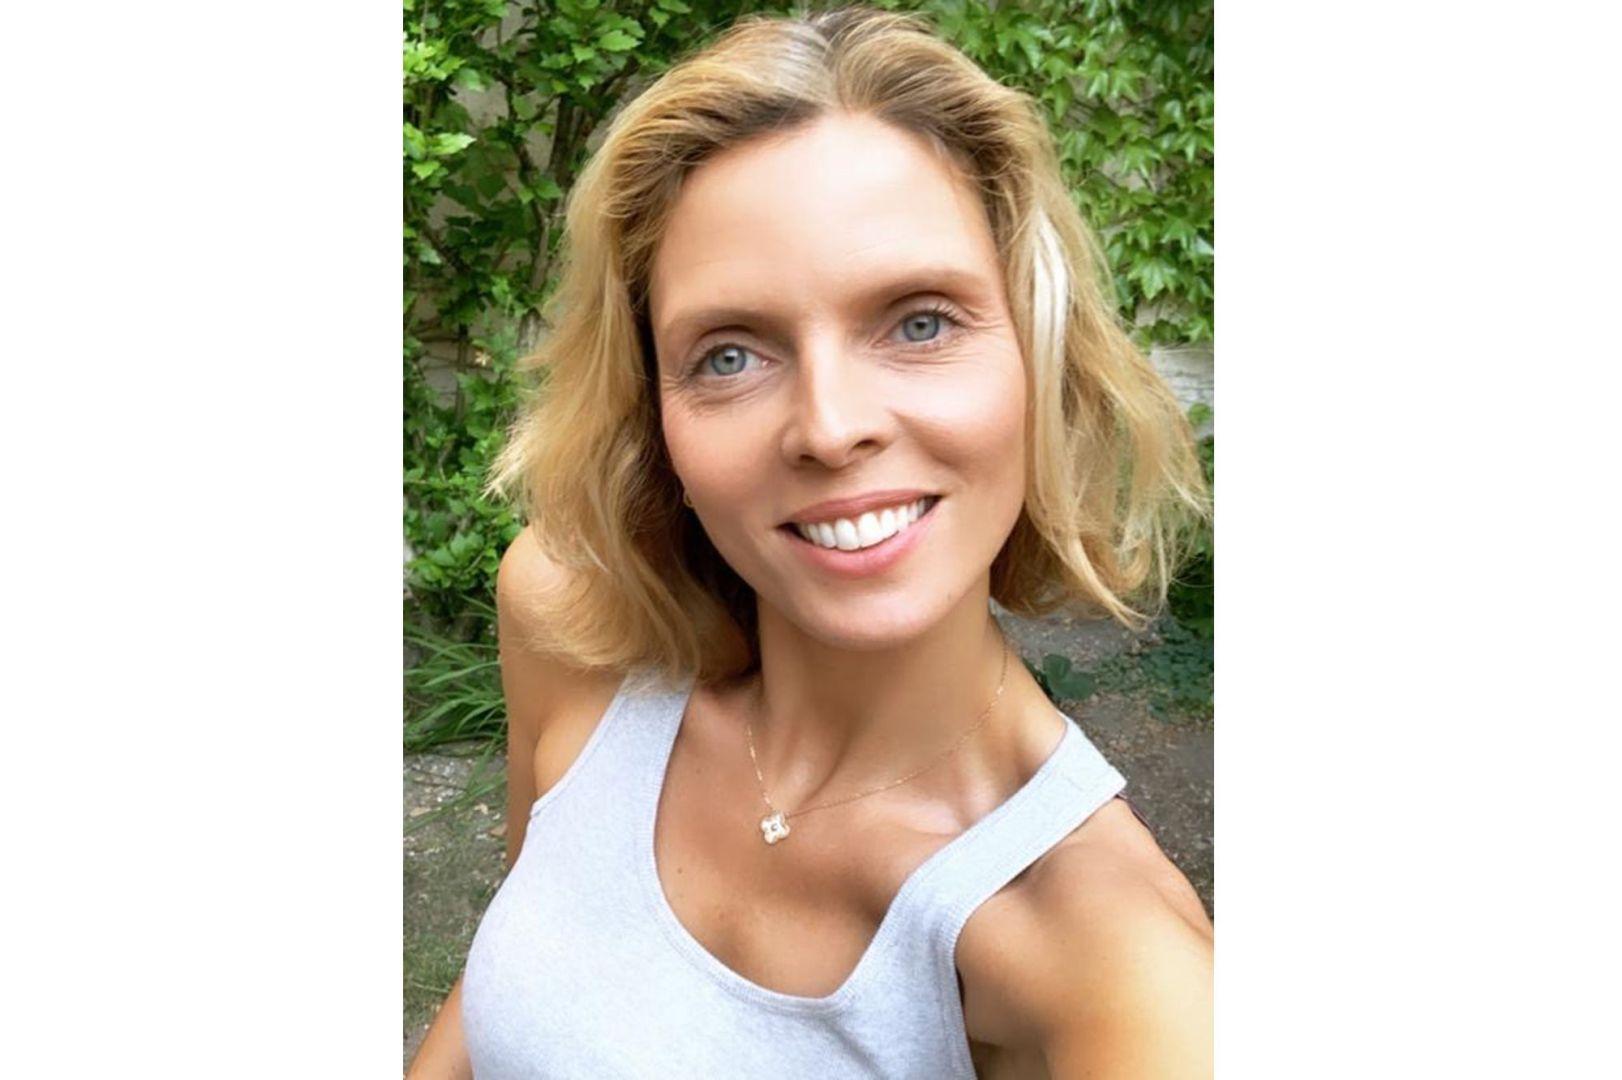 Sylvie Tellier : ce moment où elle a dû choisir entre sa carrière et son mariage